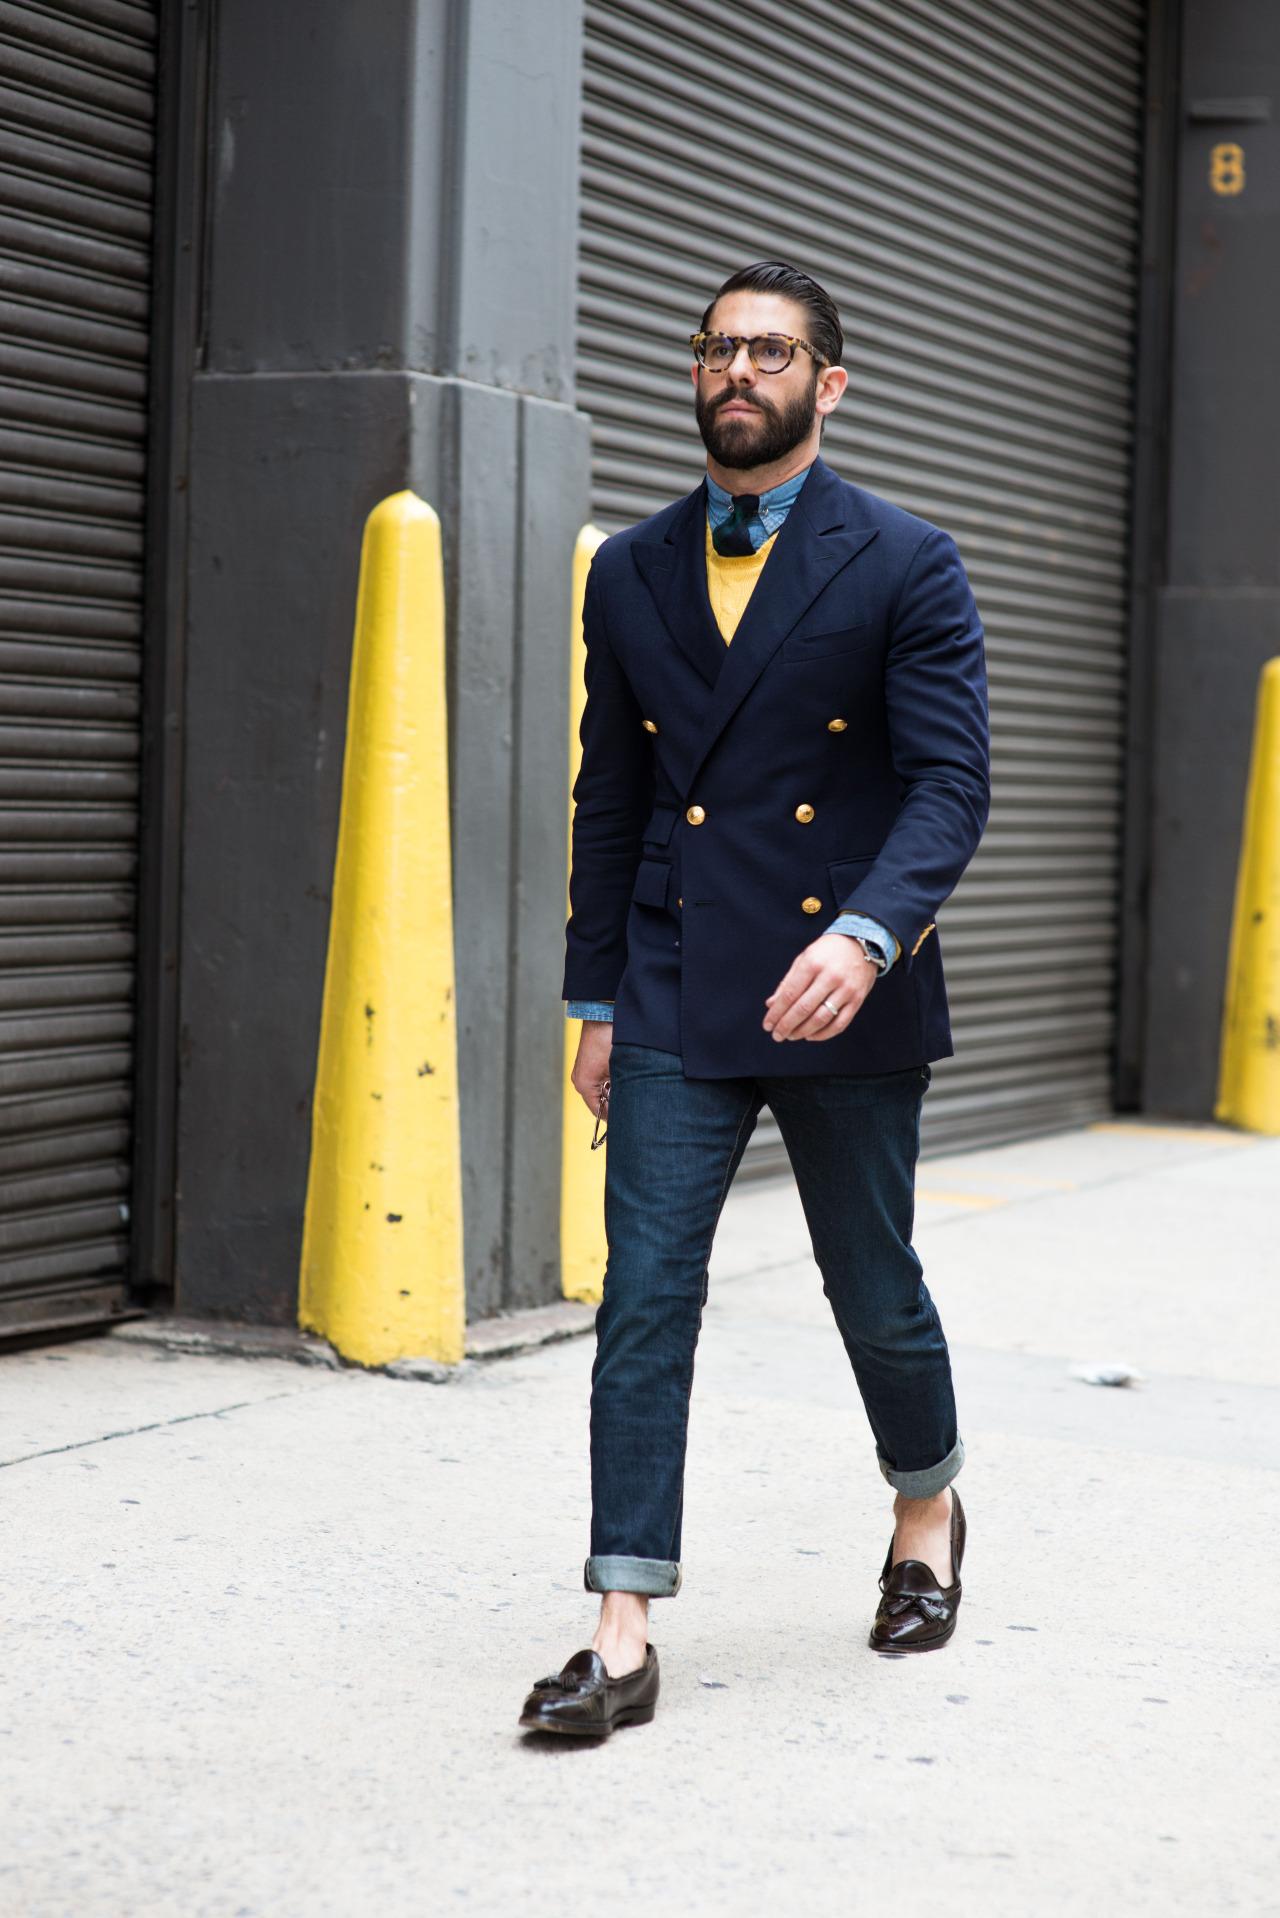 Men's Street Style Inspiration #1 | MenStyle1- Men's Style ...